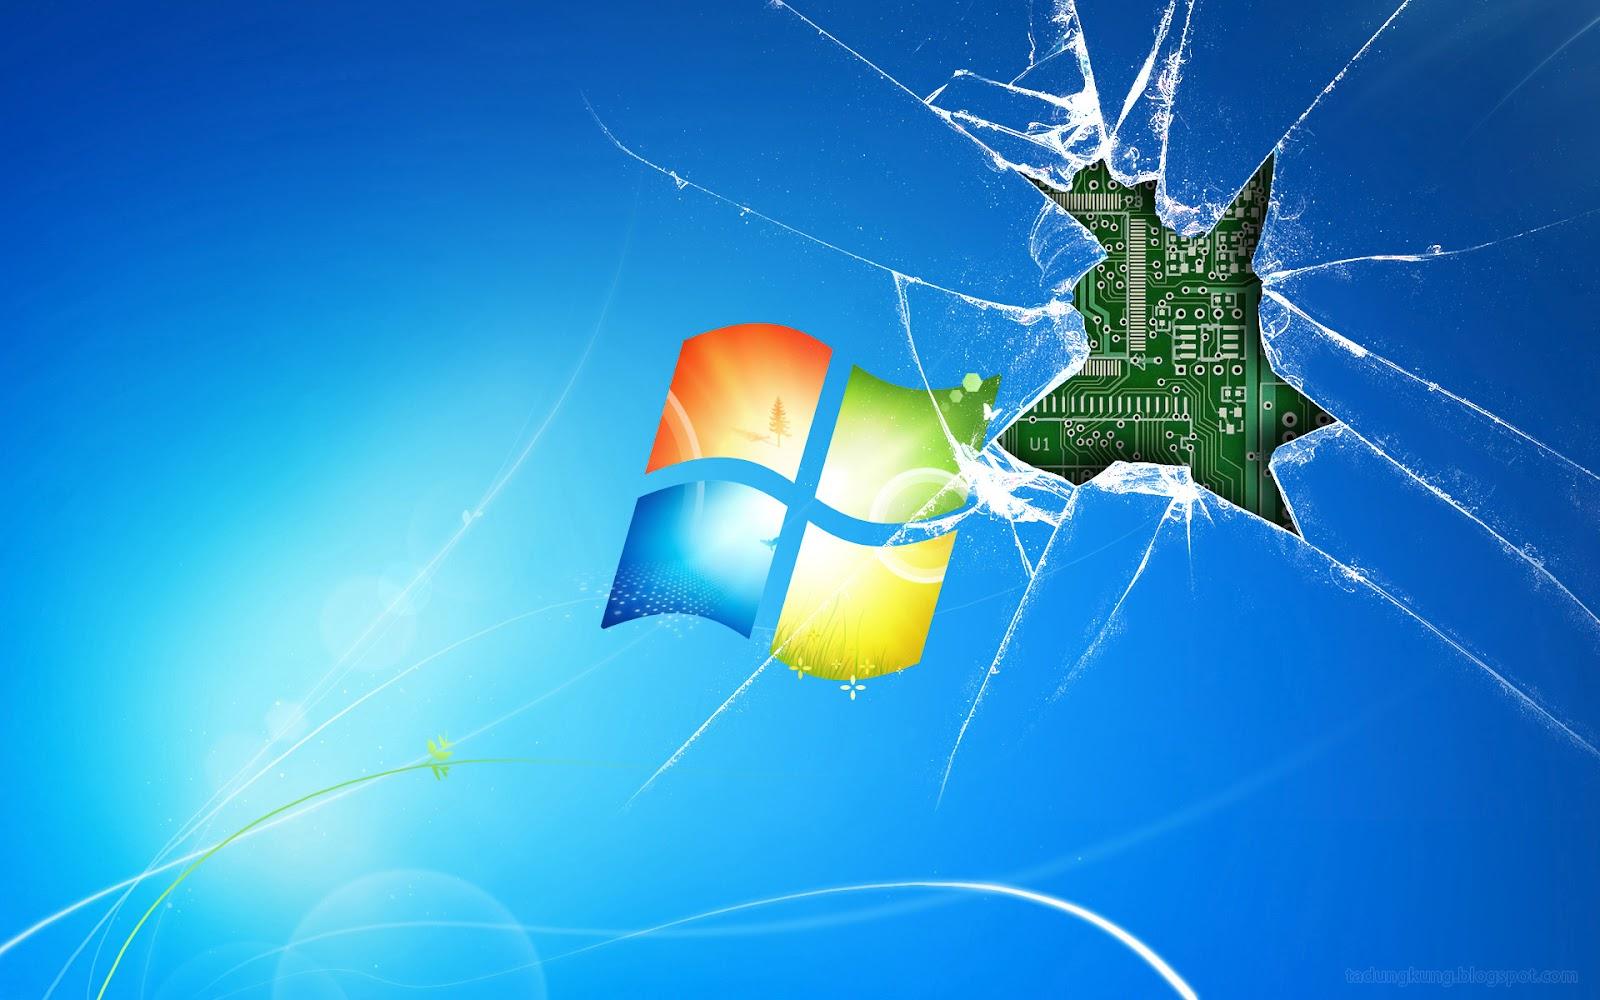 http://3.bp.blogspot.com/-M7yJuWgakdY/T60z7JxRz3I/AAAAAAAABPs/sBdaHe7jZW4/s1600/Windows_7_Broken_Screen.jpg